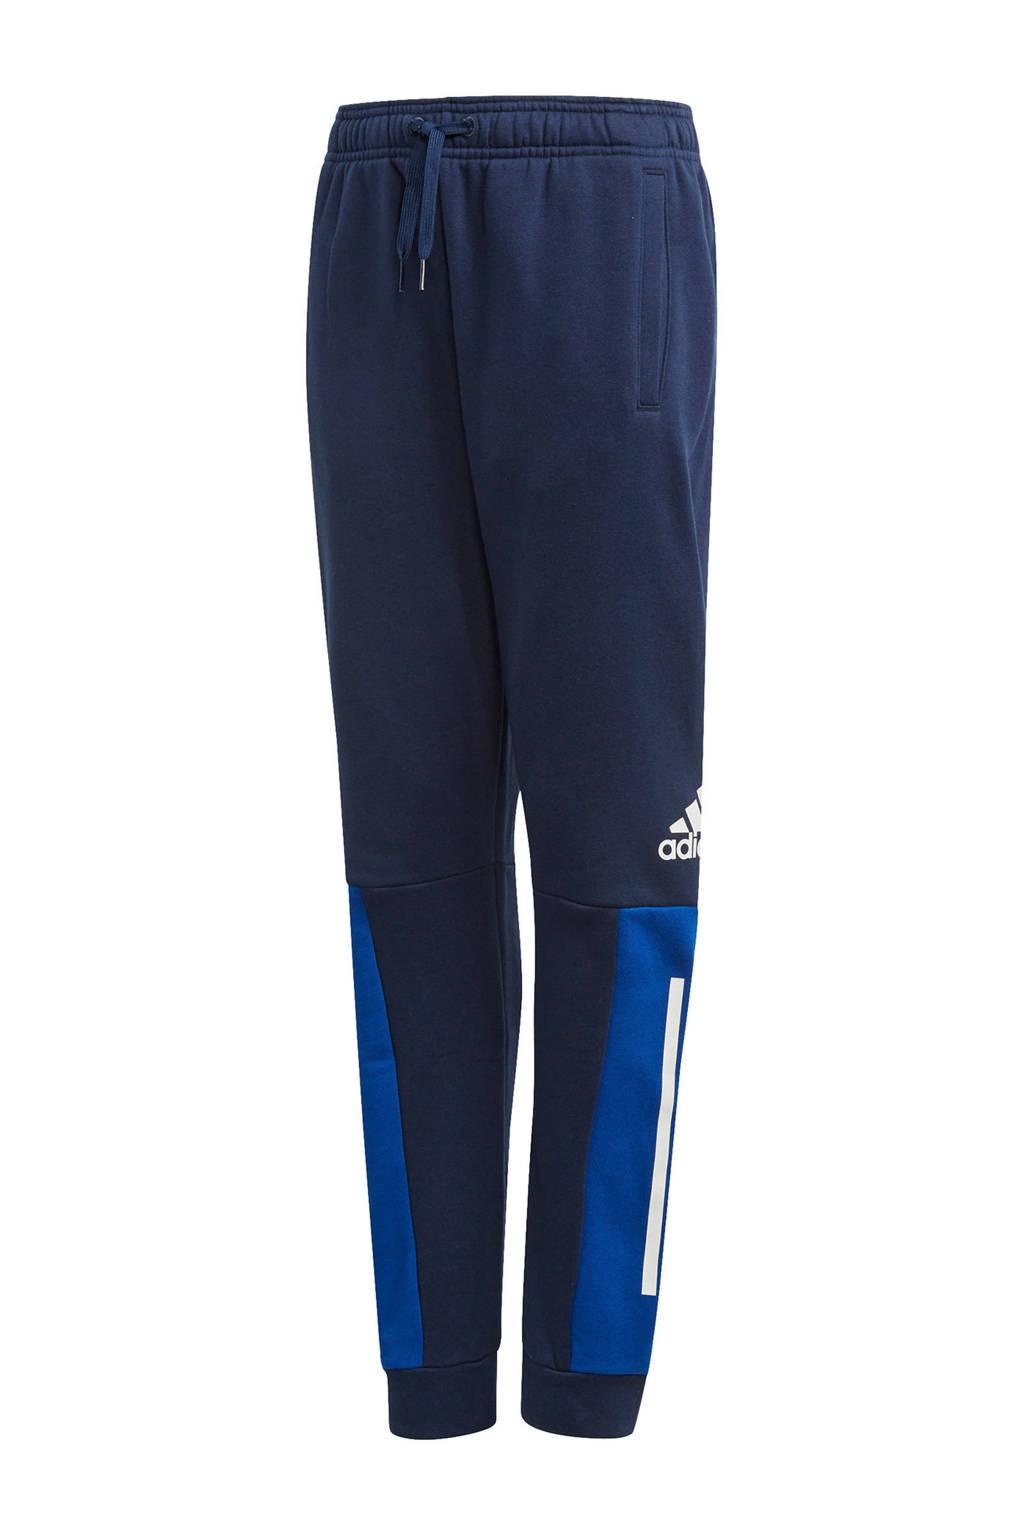 adidas   sportbroek donkerblauw/blauw, Donkerblauw/blauw